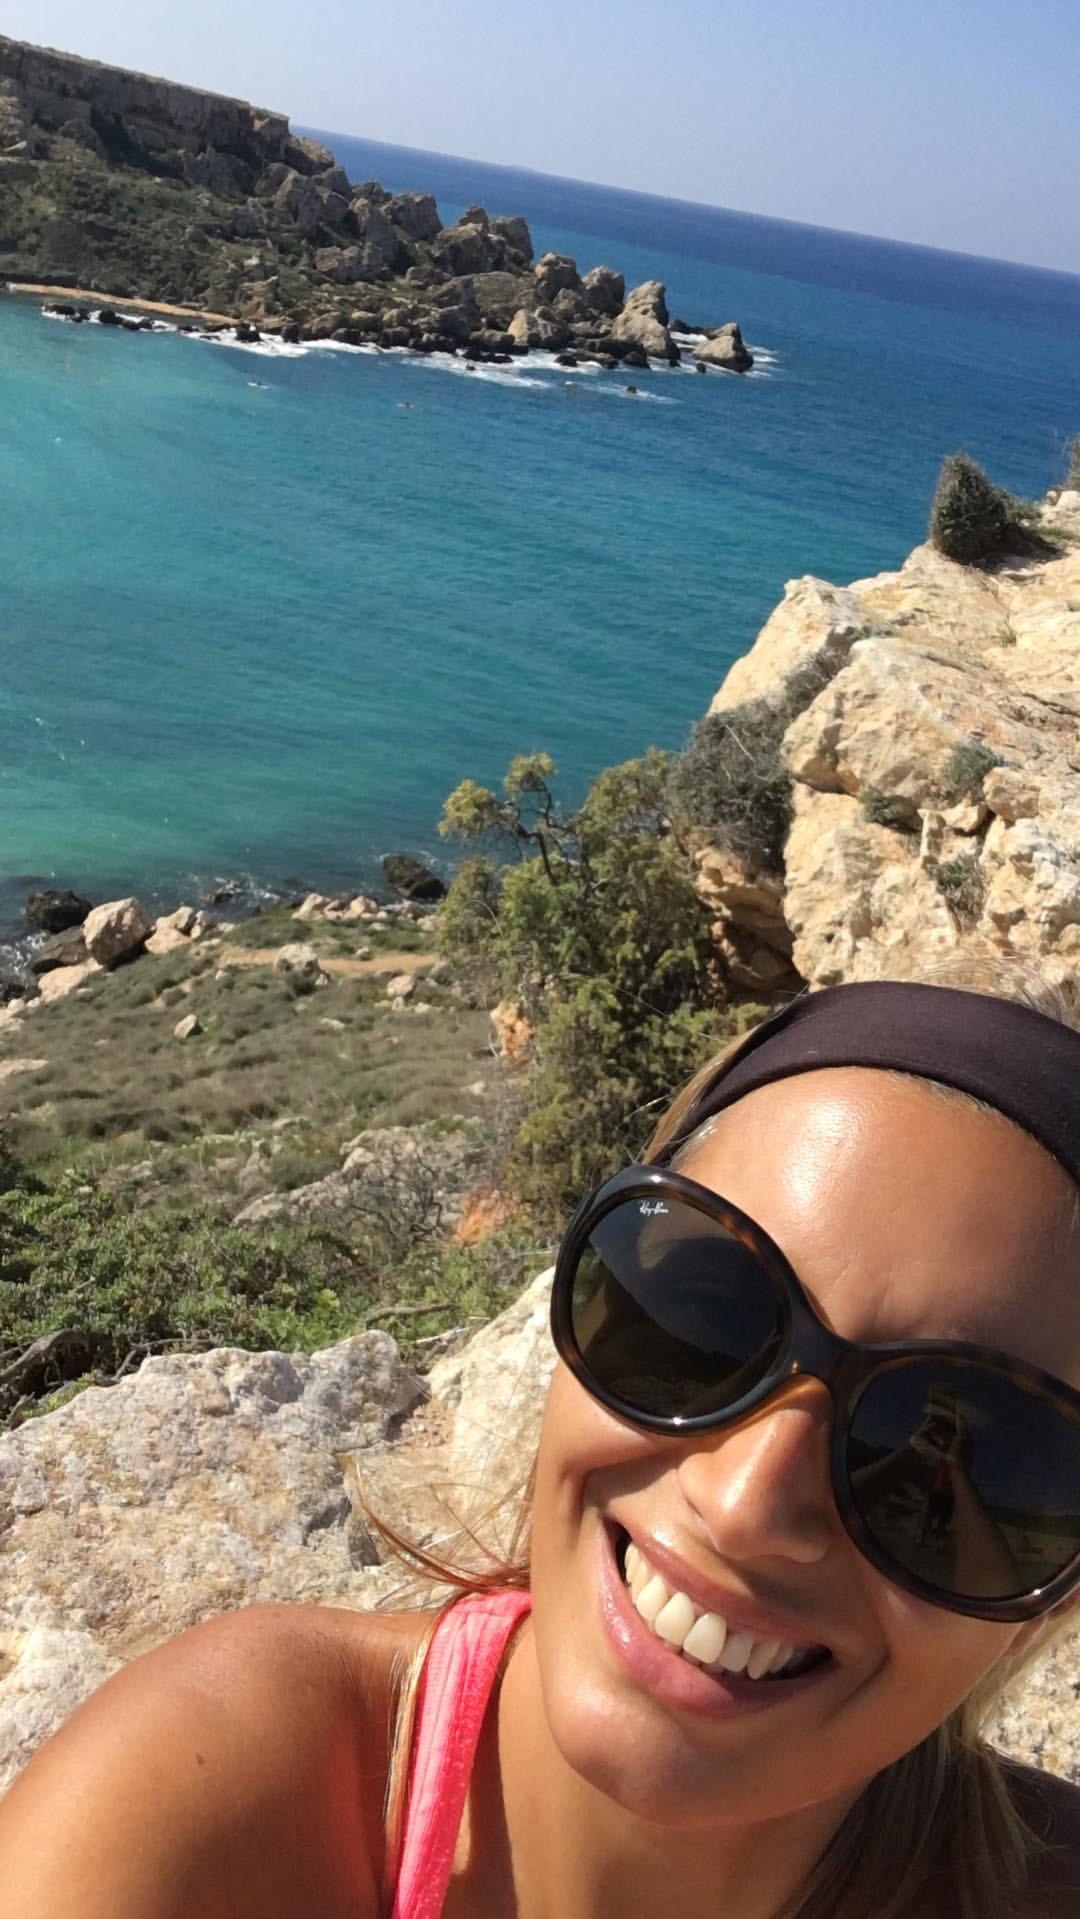 Malta - Ghajn Tuffieha Bay